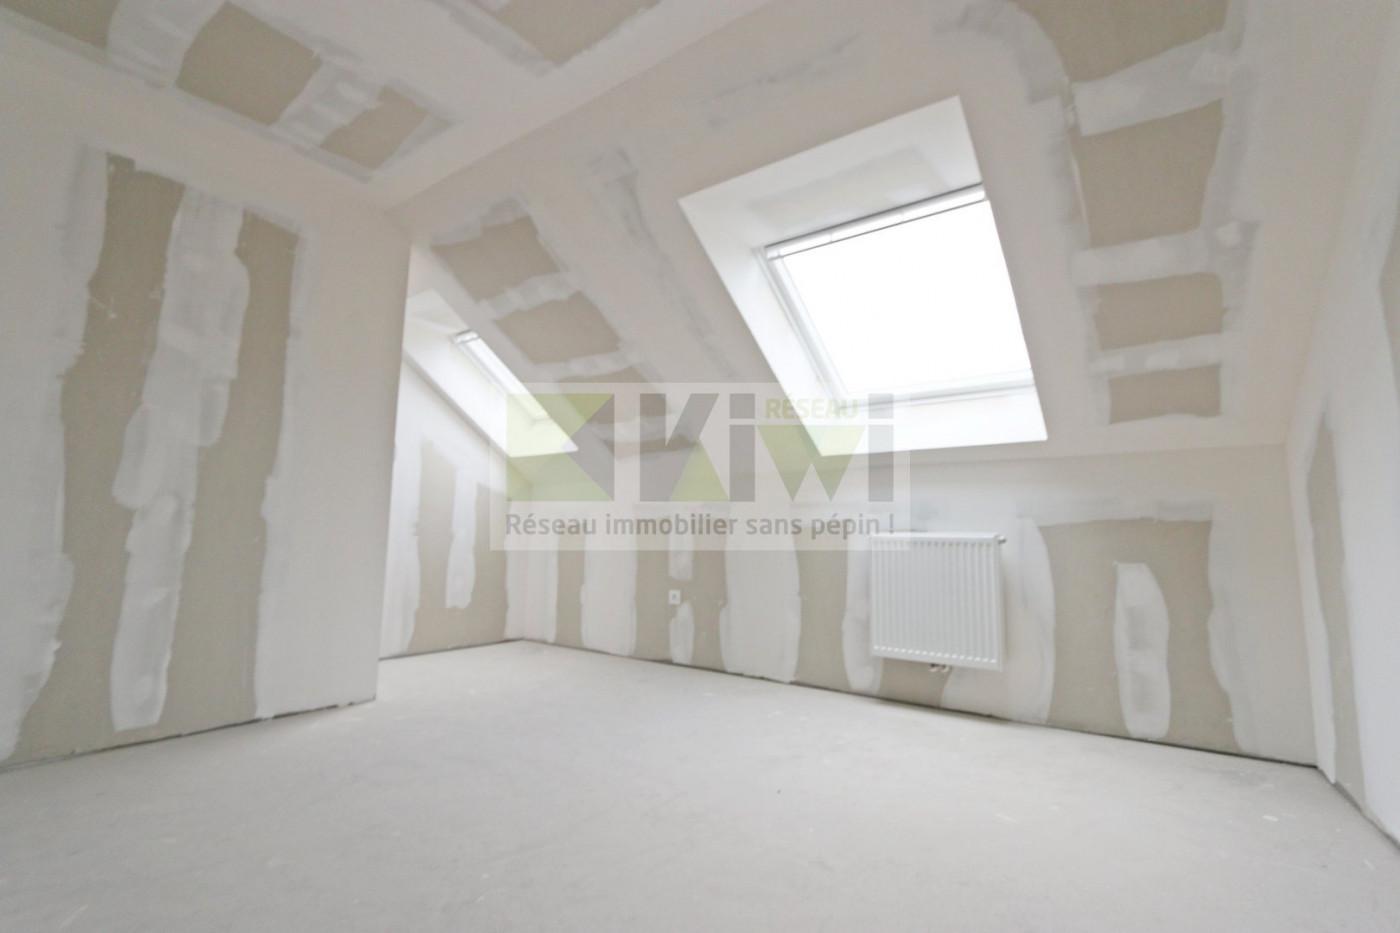 A vendre Cappelle La Grande 59013732 Kiwi immobilier